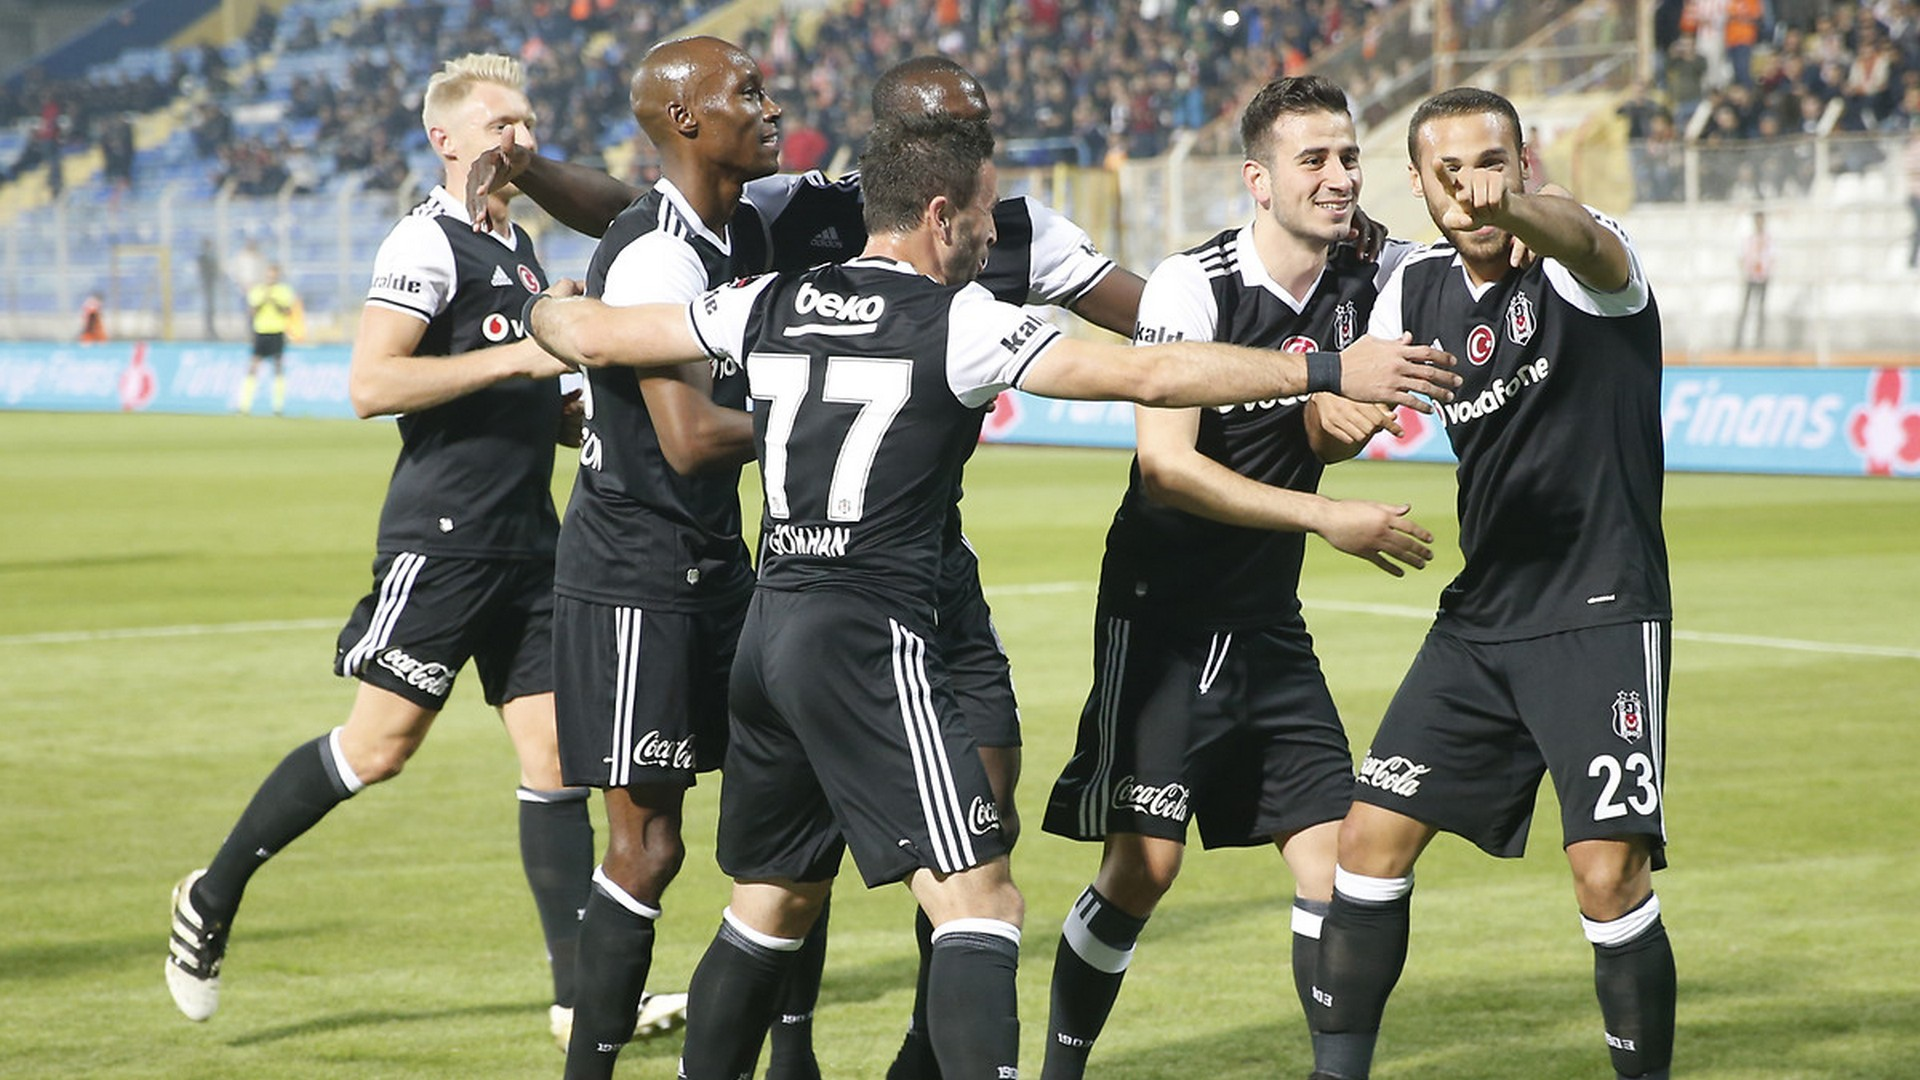 Champions: miracolo Besiktas, rimonta e pazzo 3-3 col Benfica